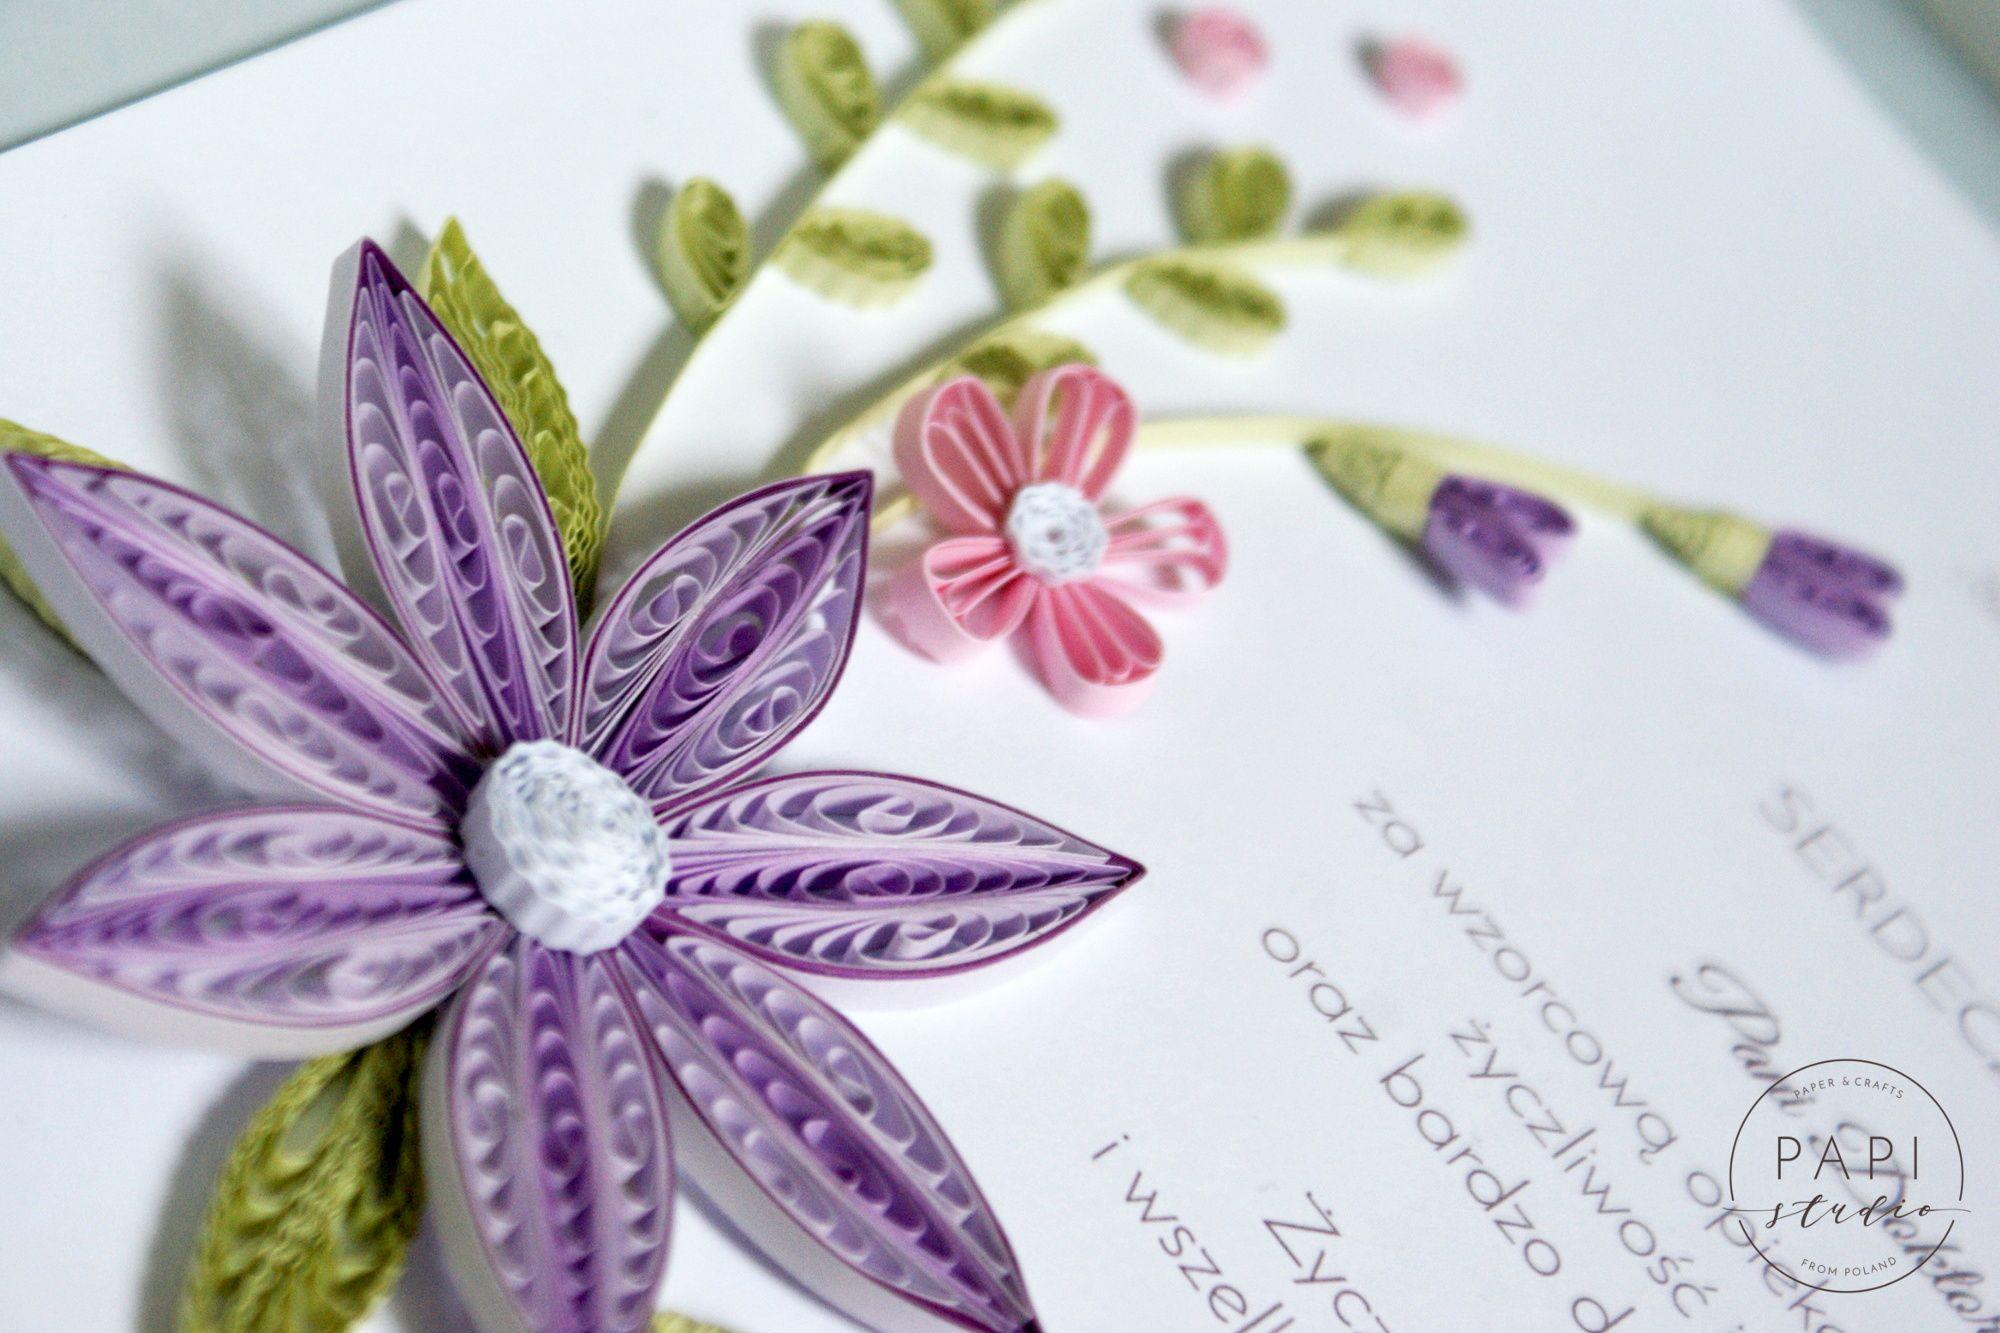 Podziekowanie Dla Lekarza Obrazek Quilling Flowers Floral Rings Floral Quilling